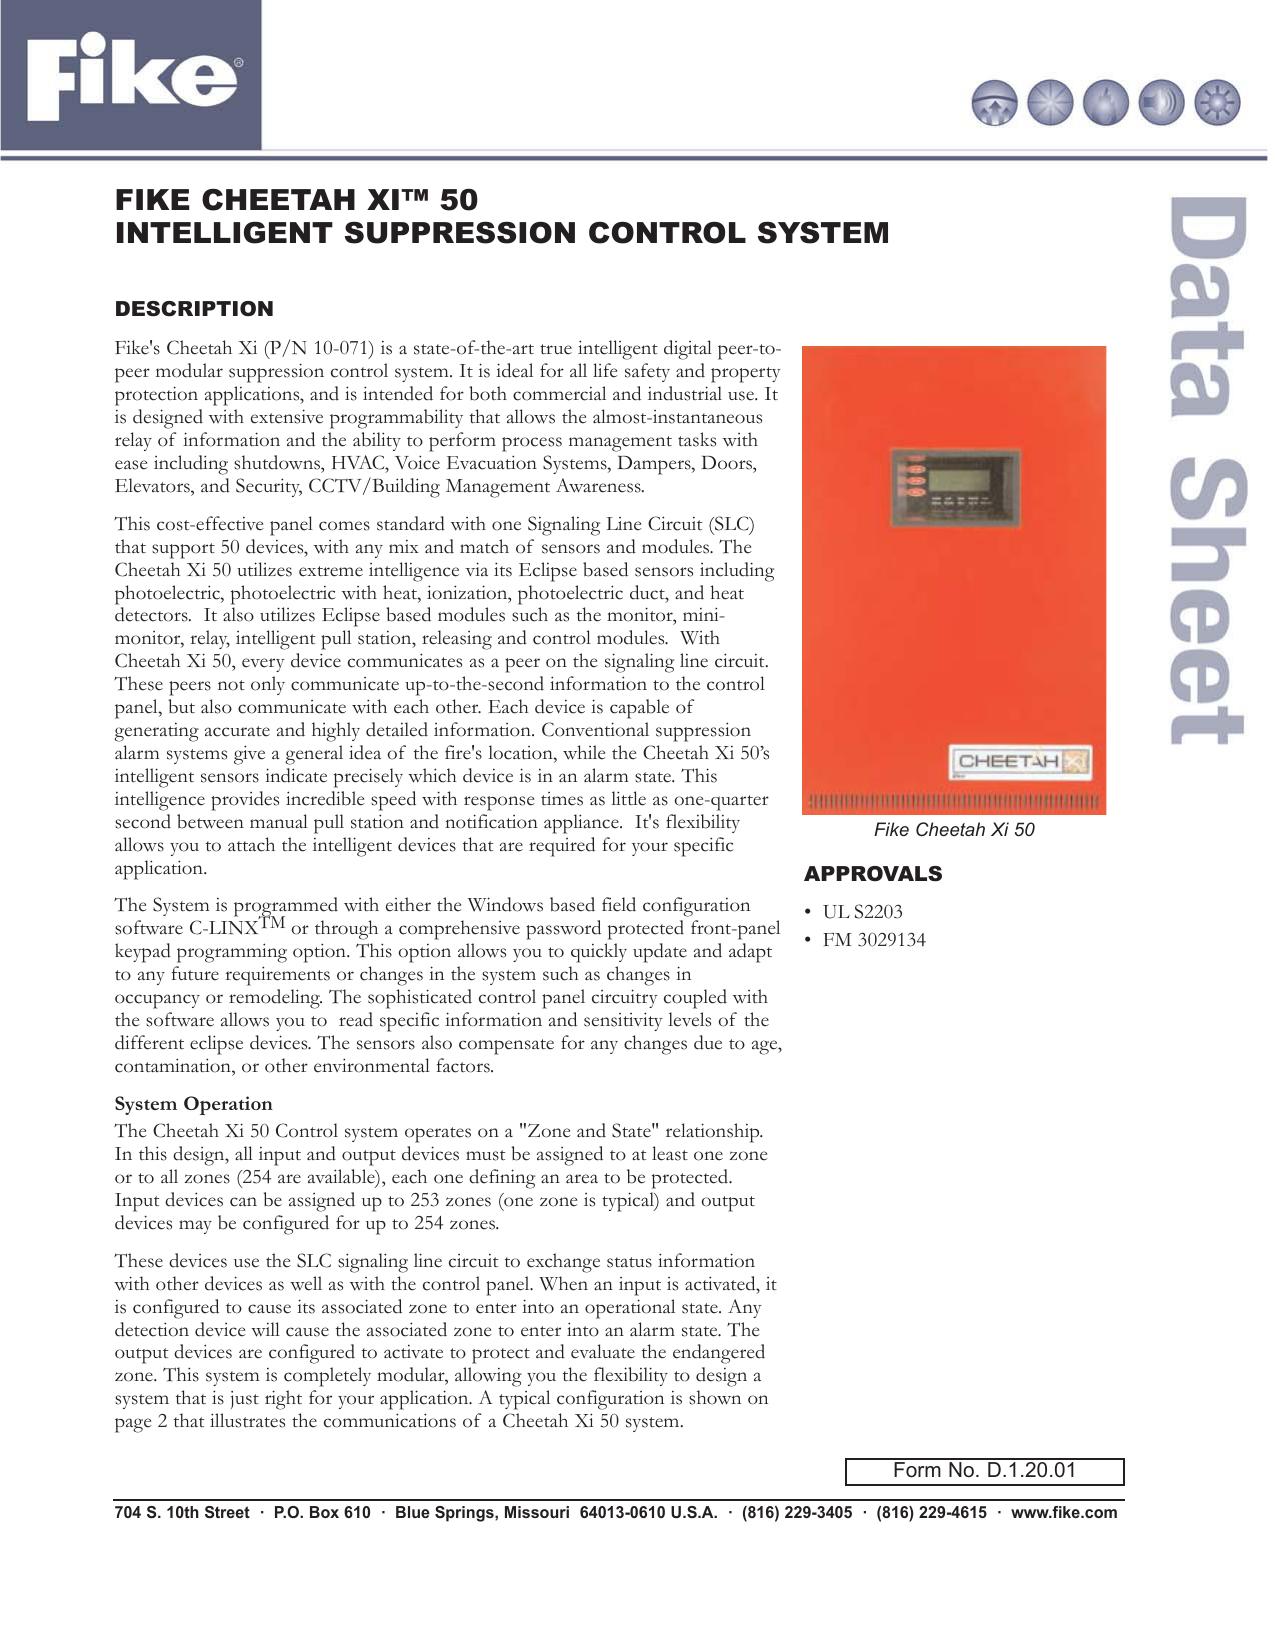 Cheetah Xi-50 Intelligent Suppression Control System D 1.20.01 |  manualzz.com